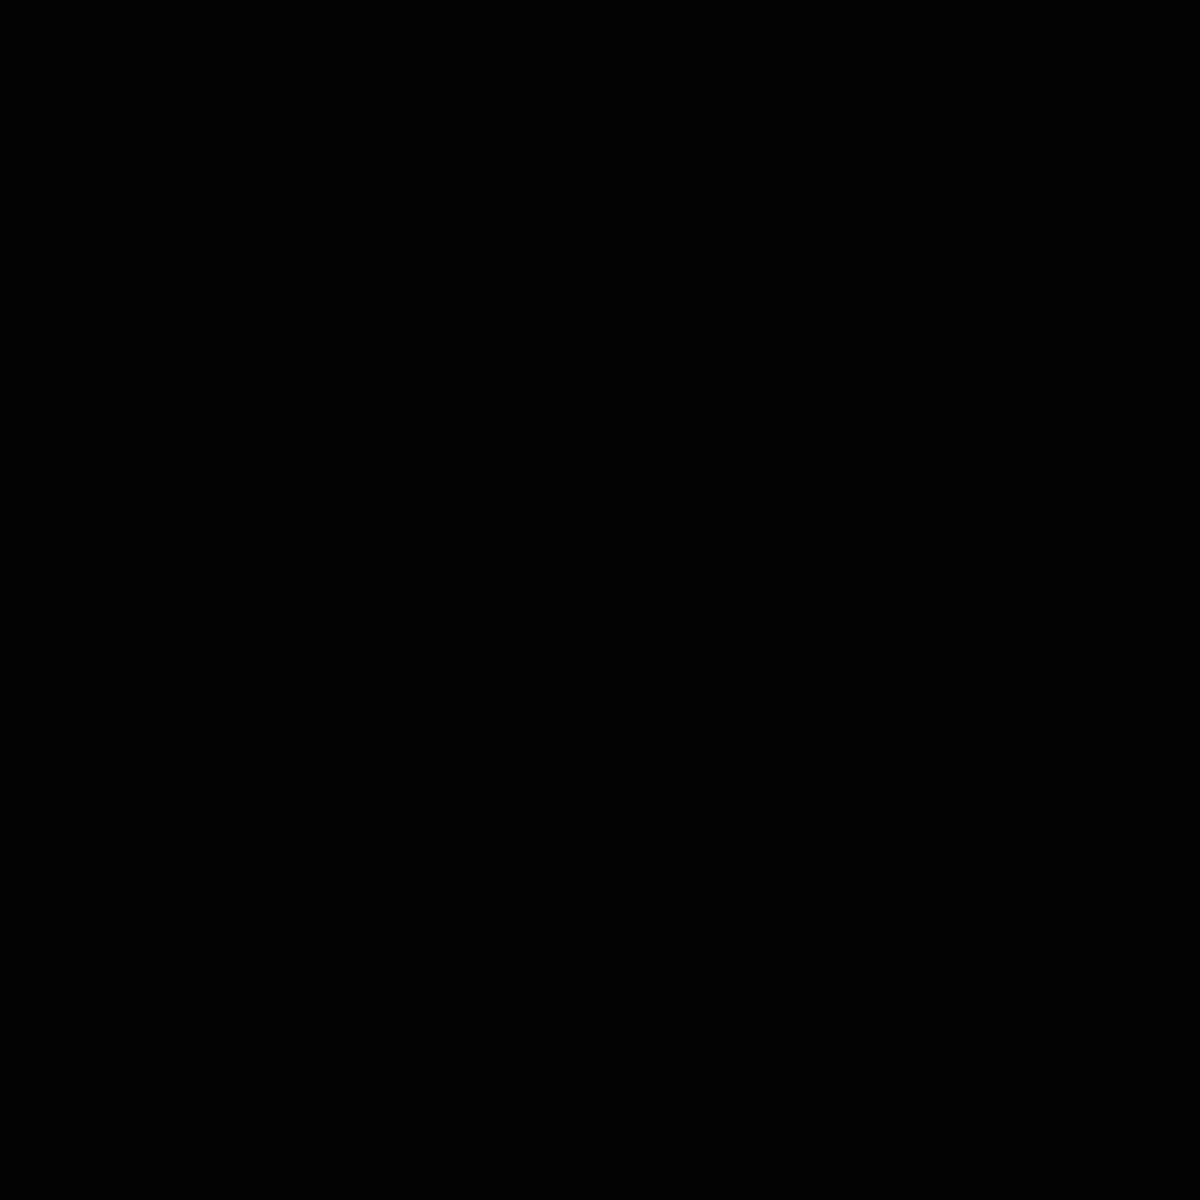 I will create an amazing neon logo animation video intro